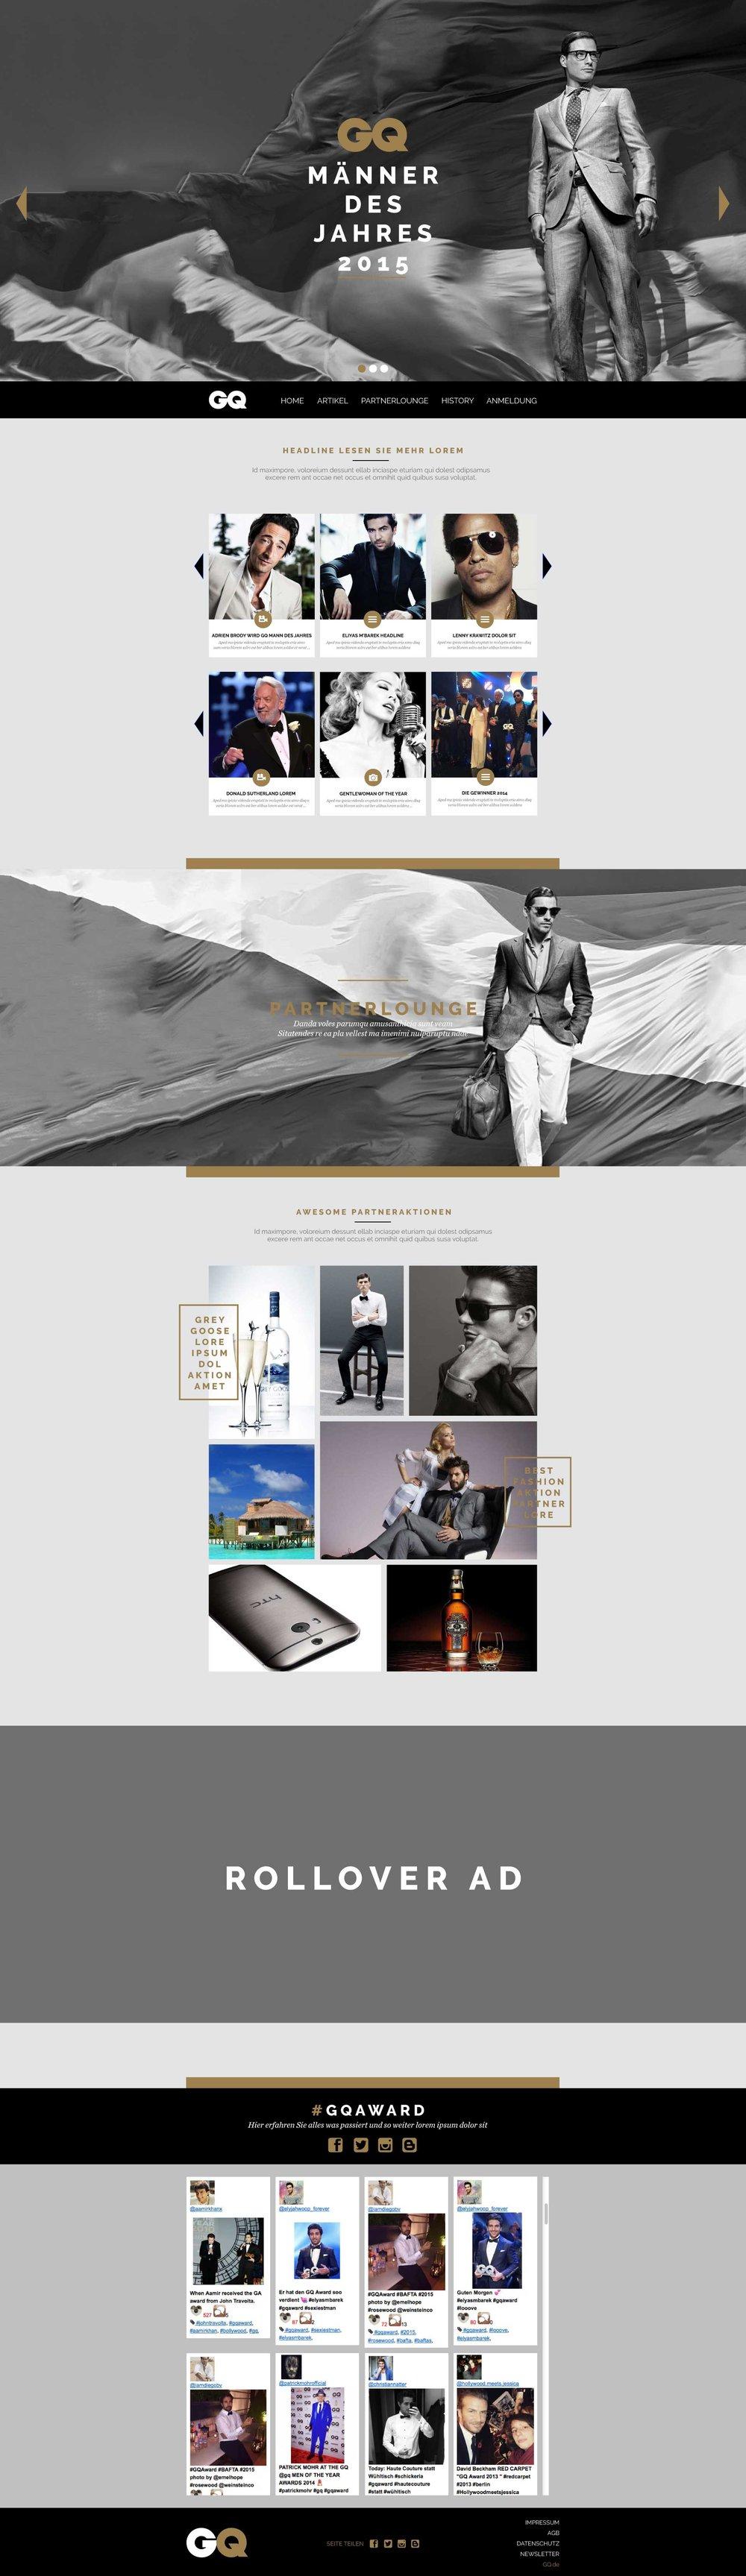 Mockup_GQ_MOTY_Website_2015_Entwurf_1.jpg